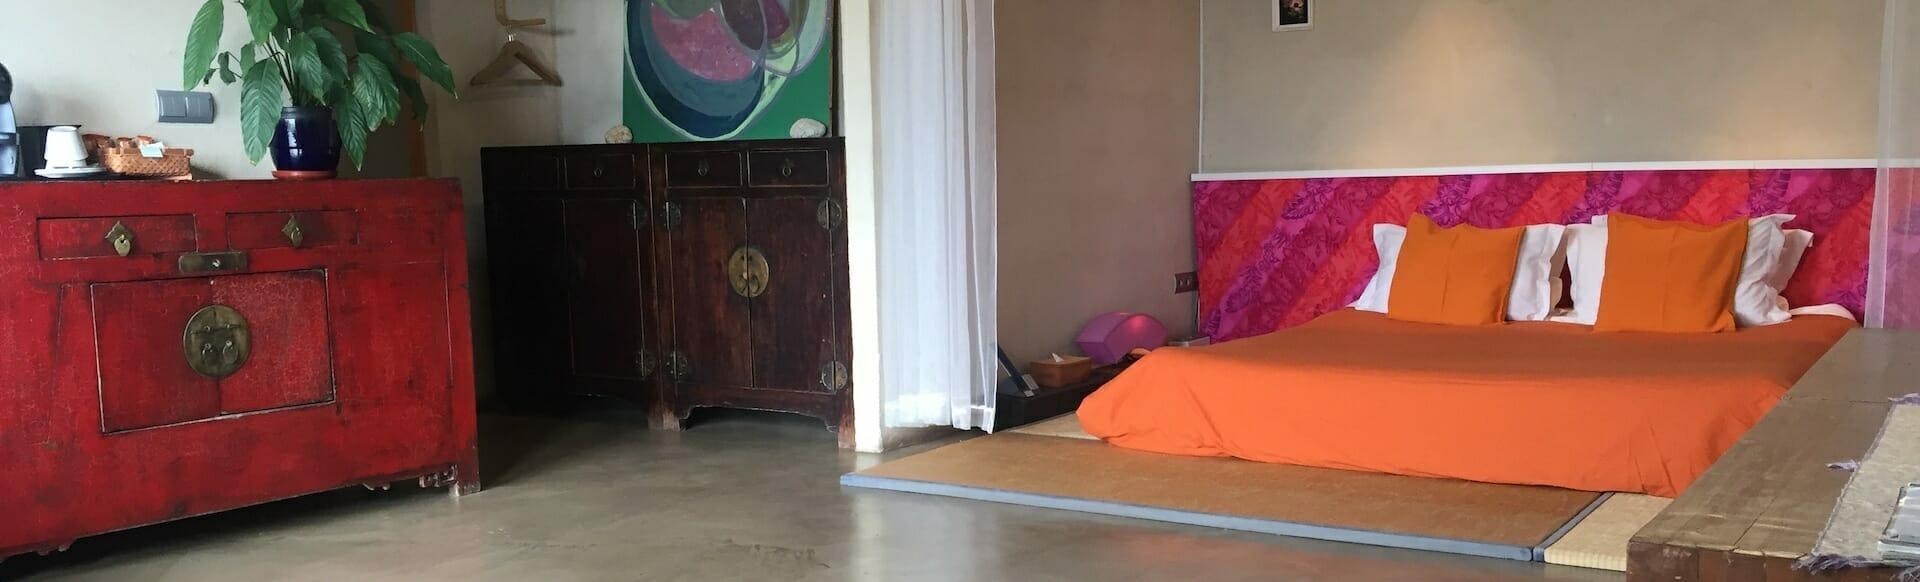 habitacion 2 cama mueble rojo